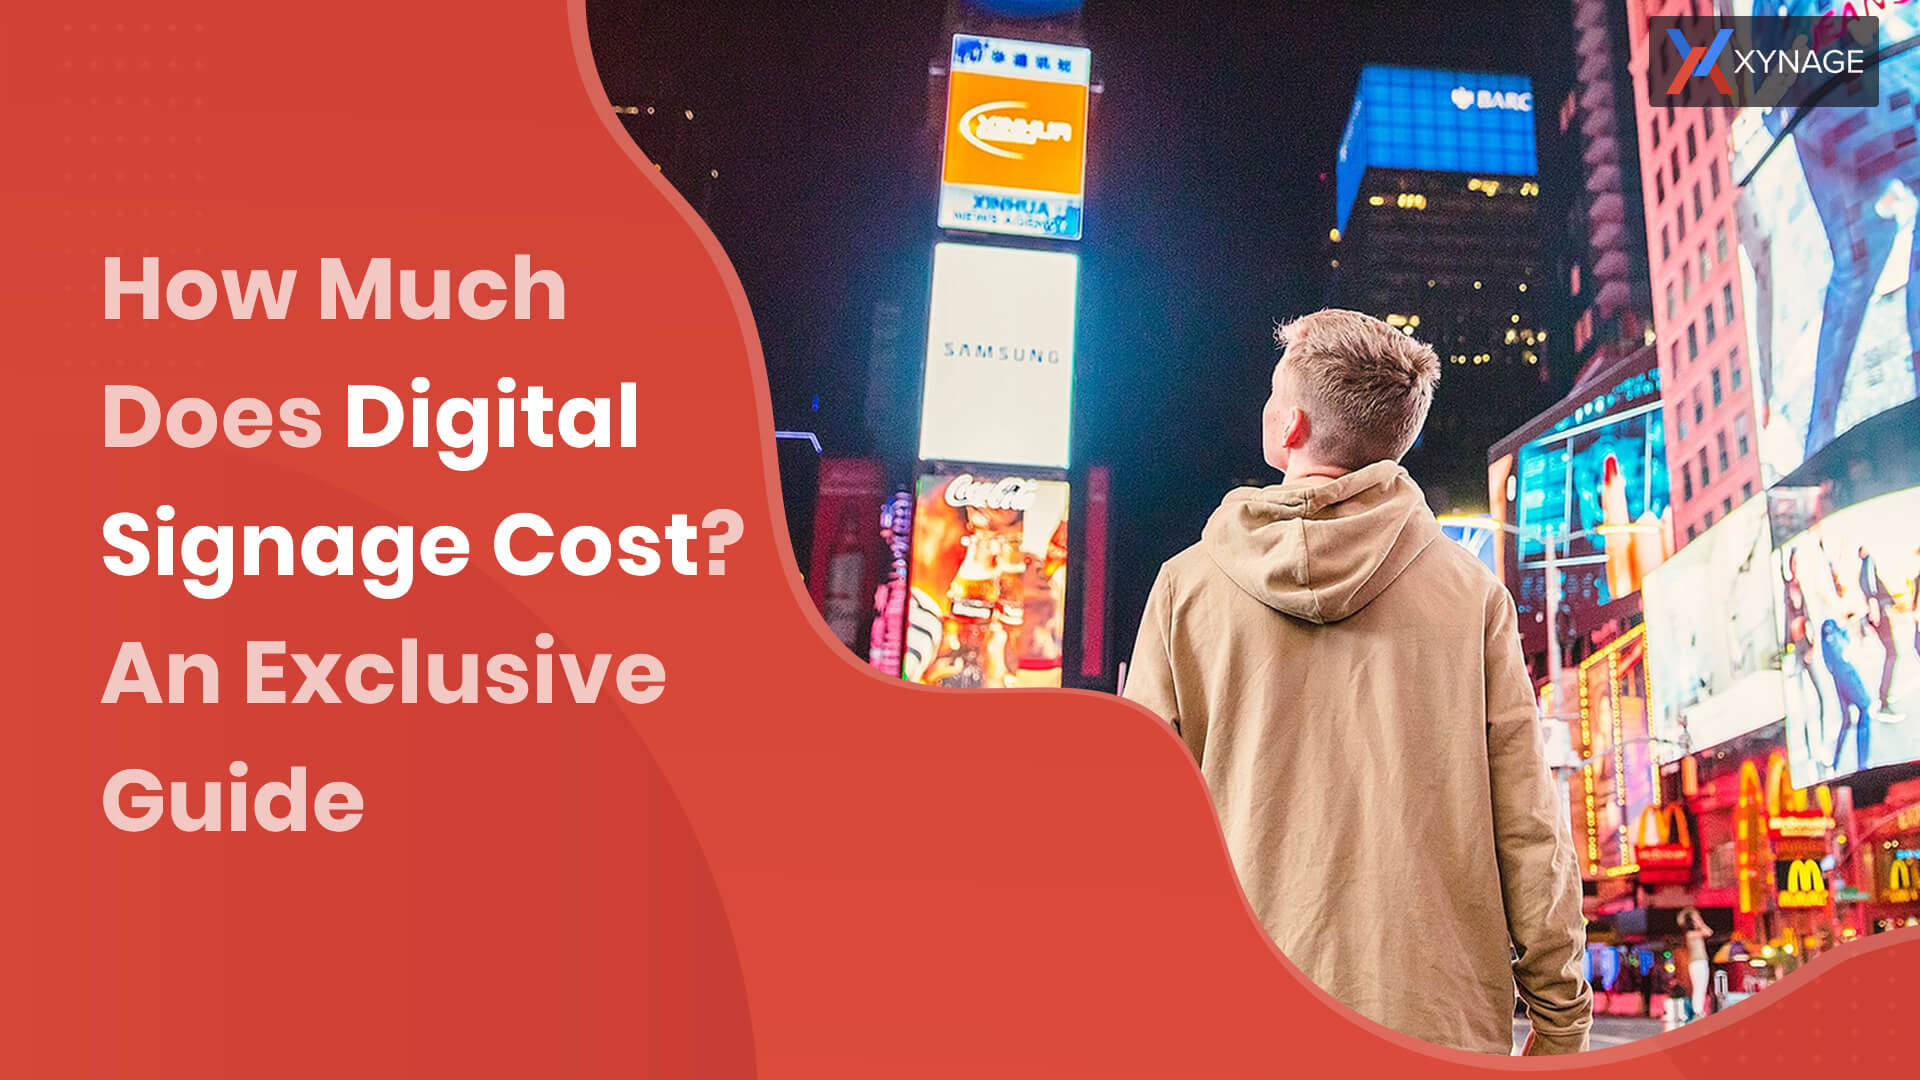 Digital Signage Cost